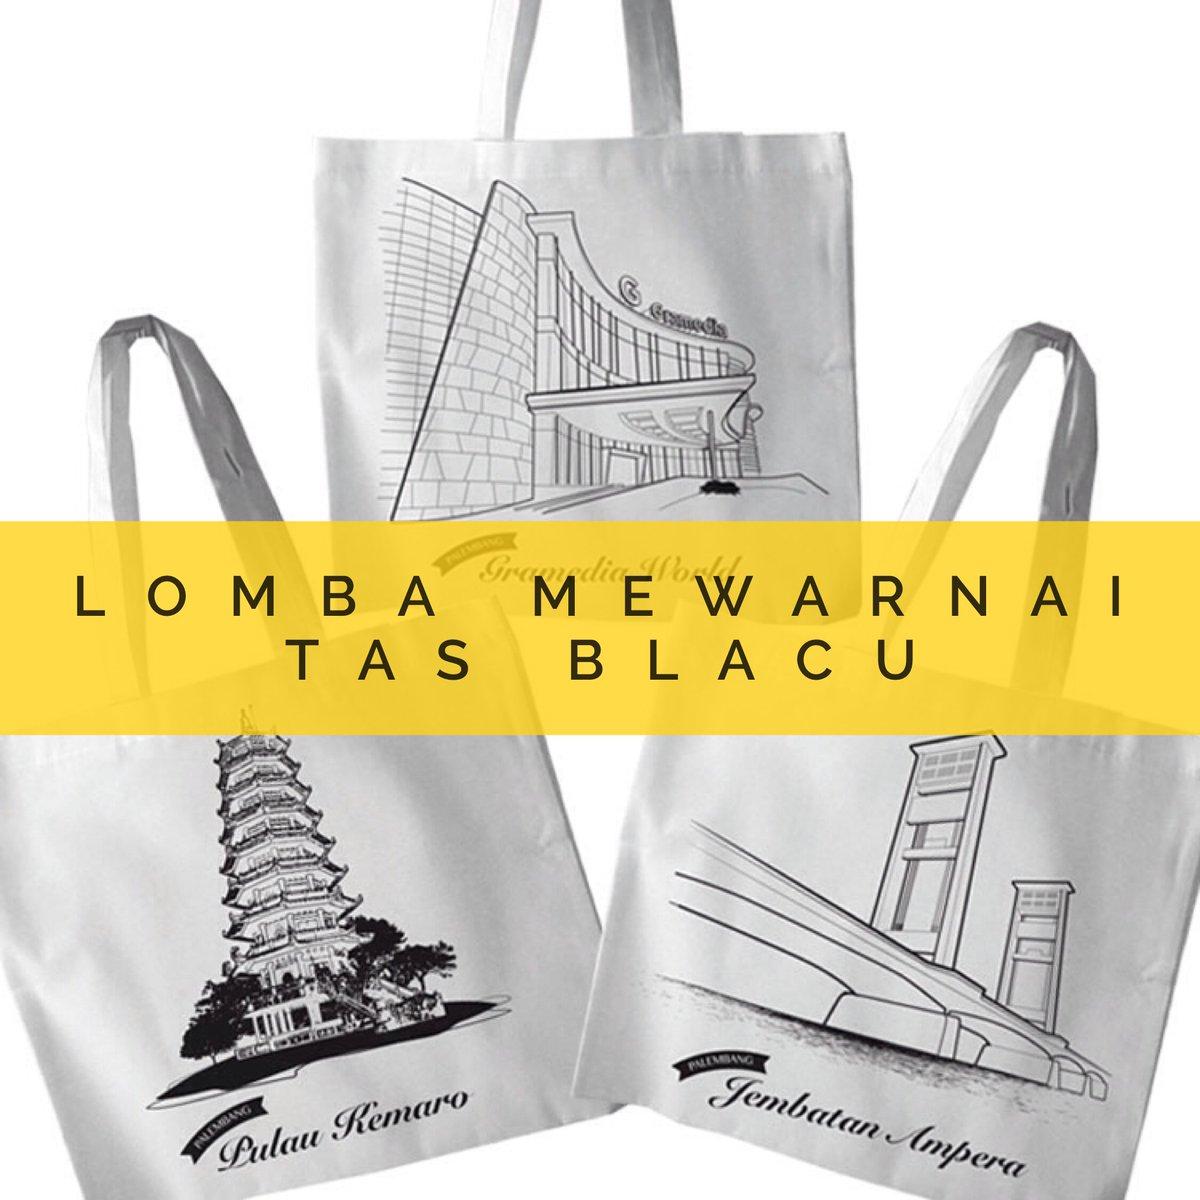 Gramedia World Palembang On Twitter Grameds Ikuti Lomba Mewarnai